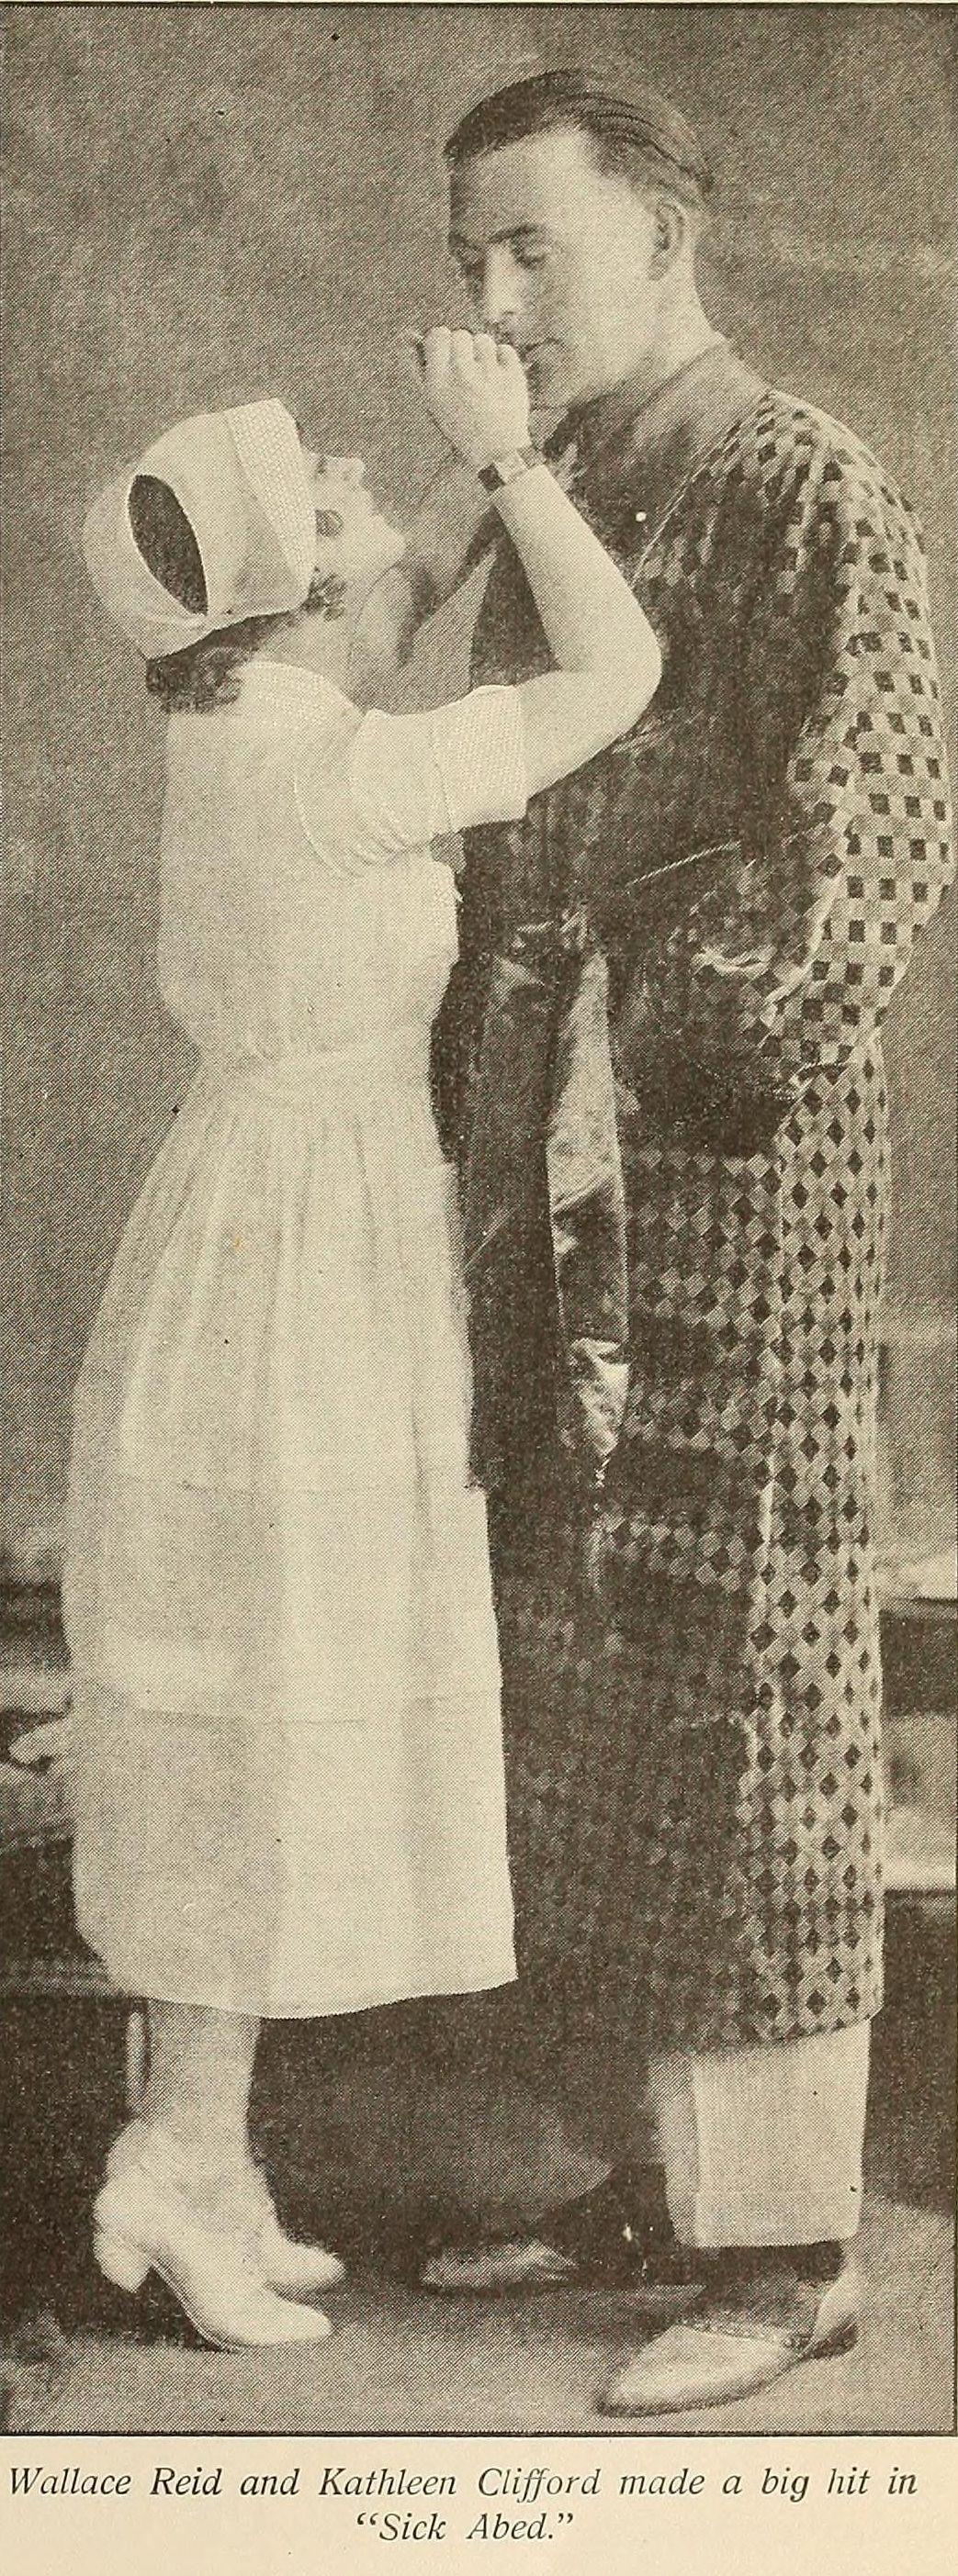 Patsy Rowlands (1931?005),Leslie Marshall (journalist) Erotic pic Flora Robson,Dorothy Coburn